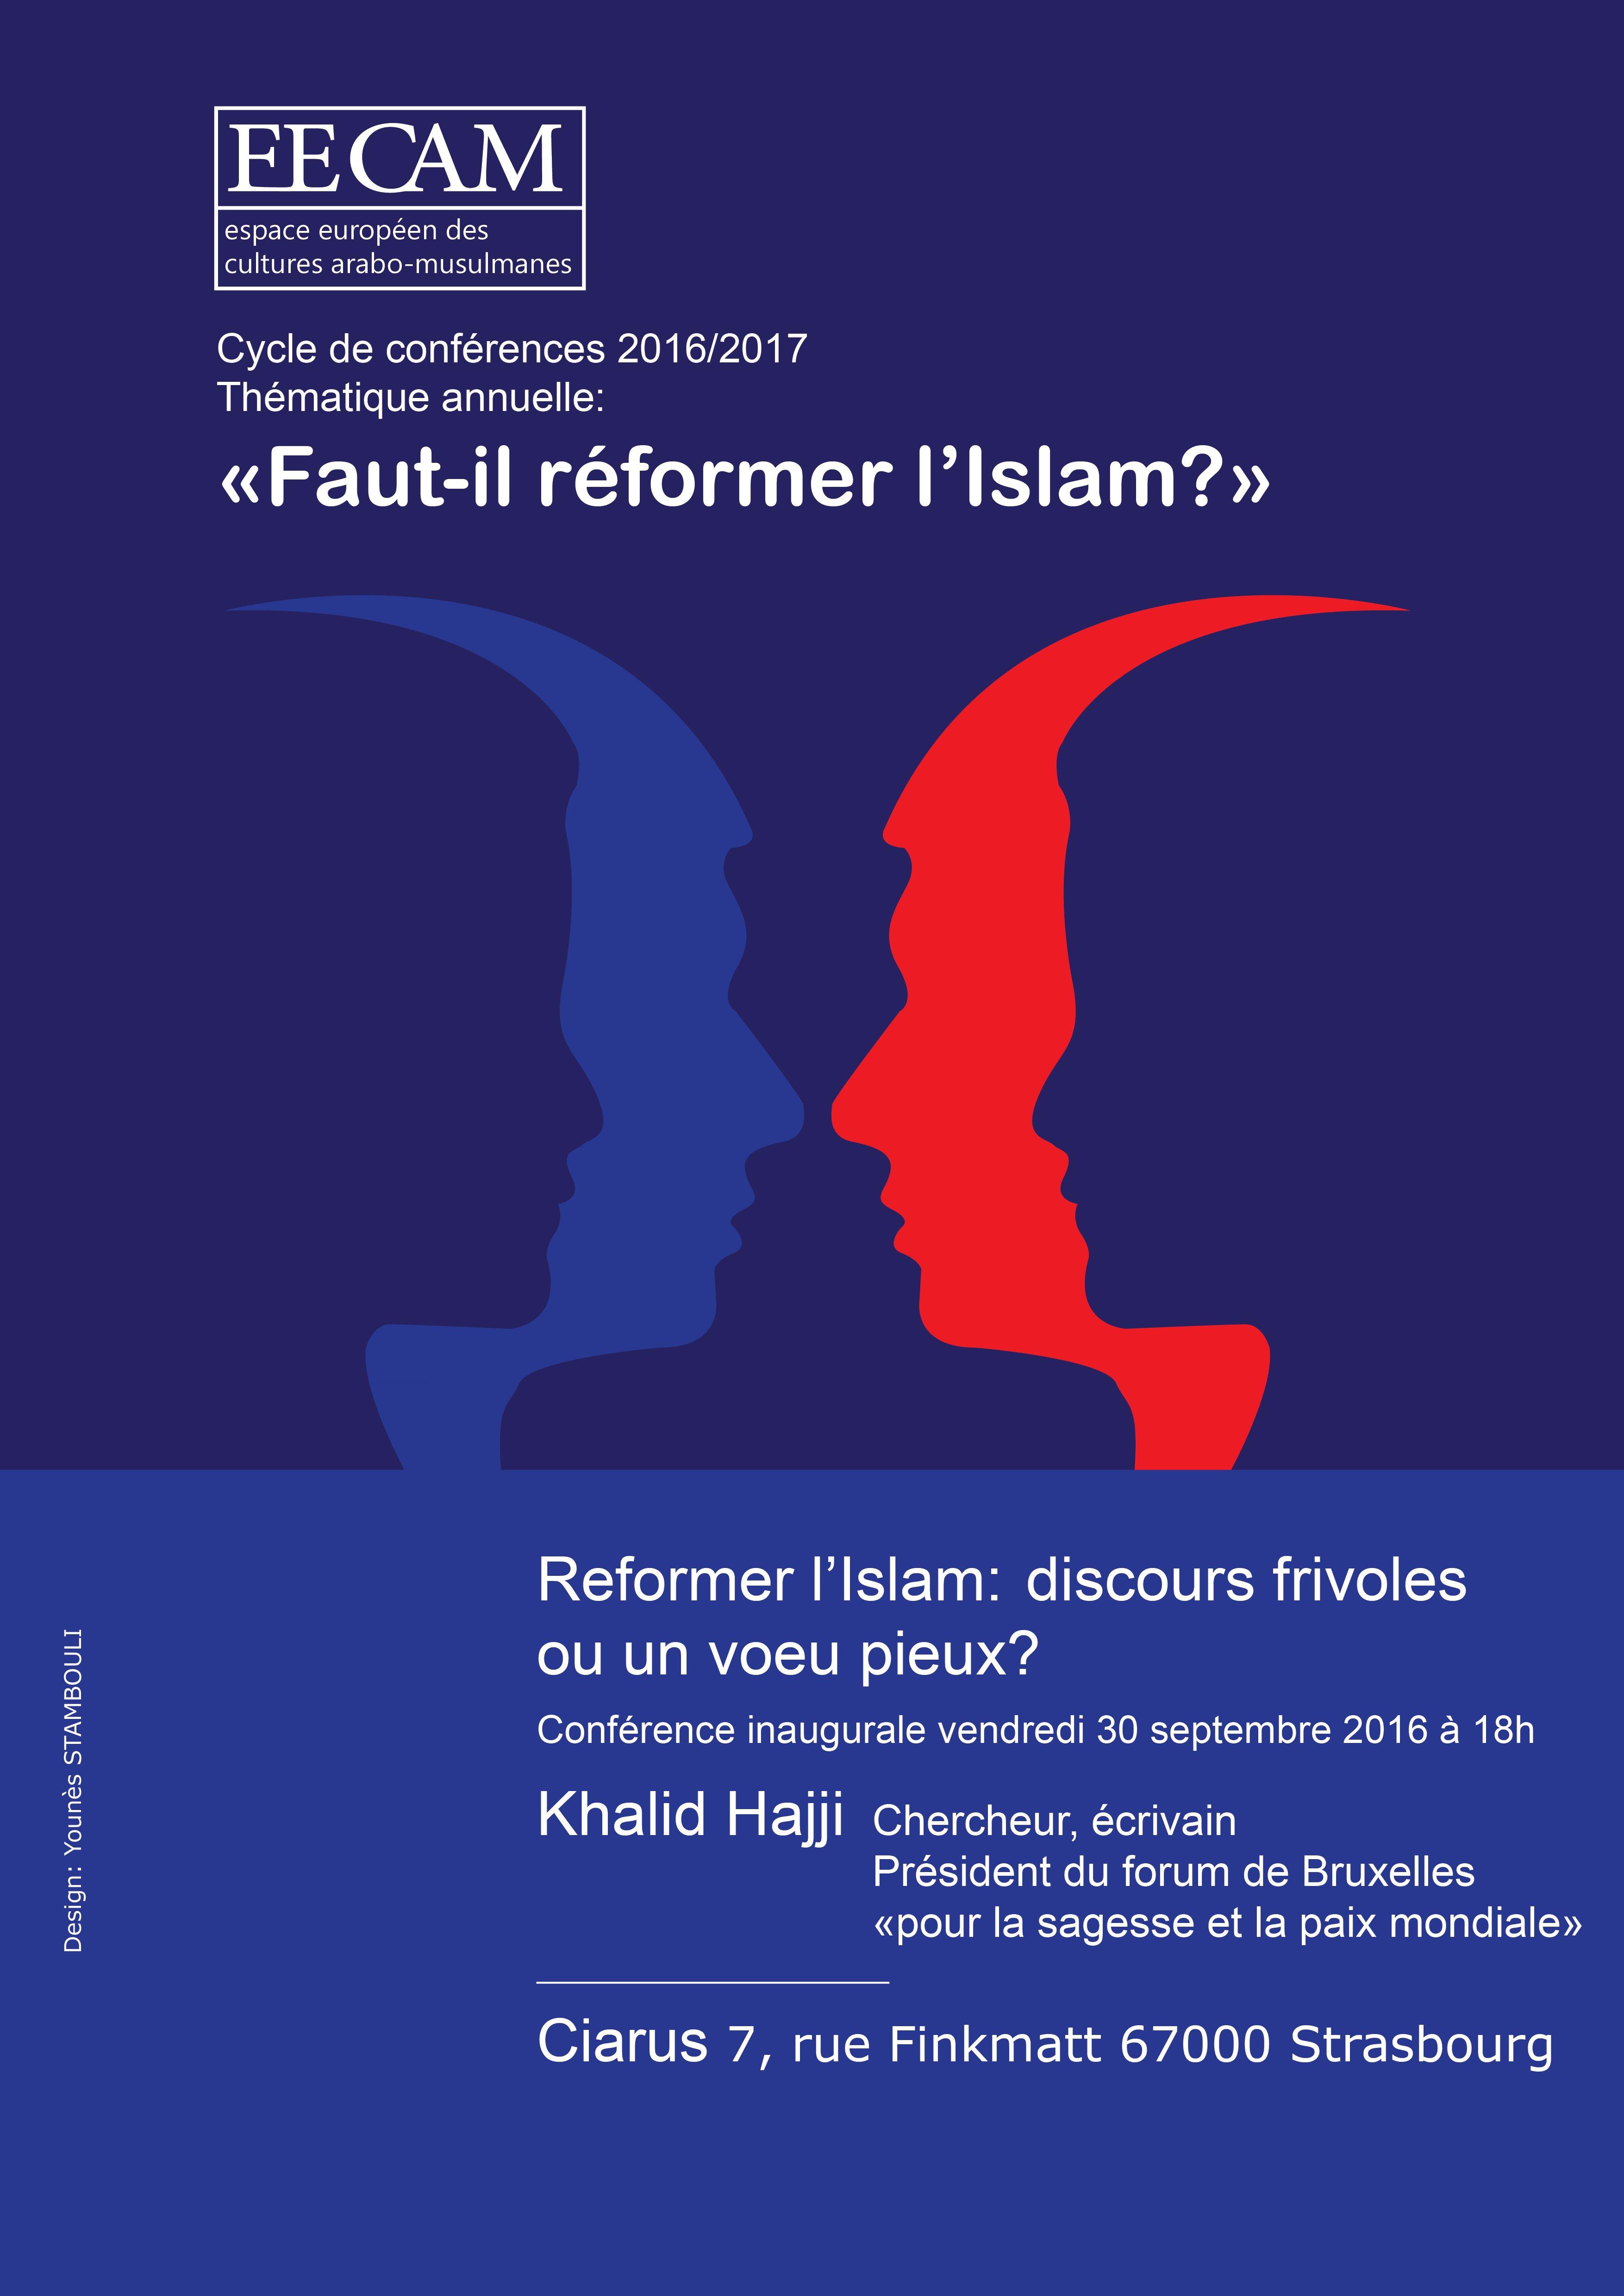 http://www.saphirnews.com/agenda/Faut-il-reformer-l-islam_ae414750.html